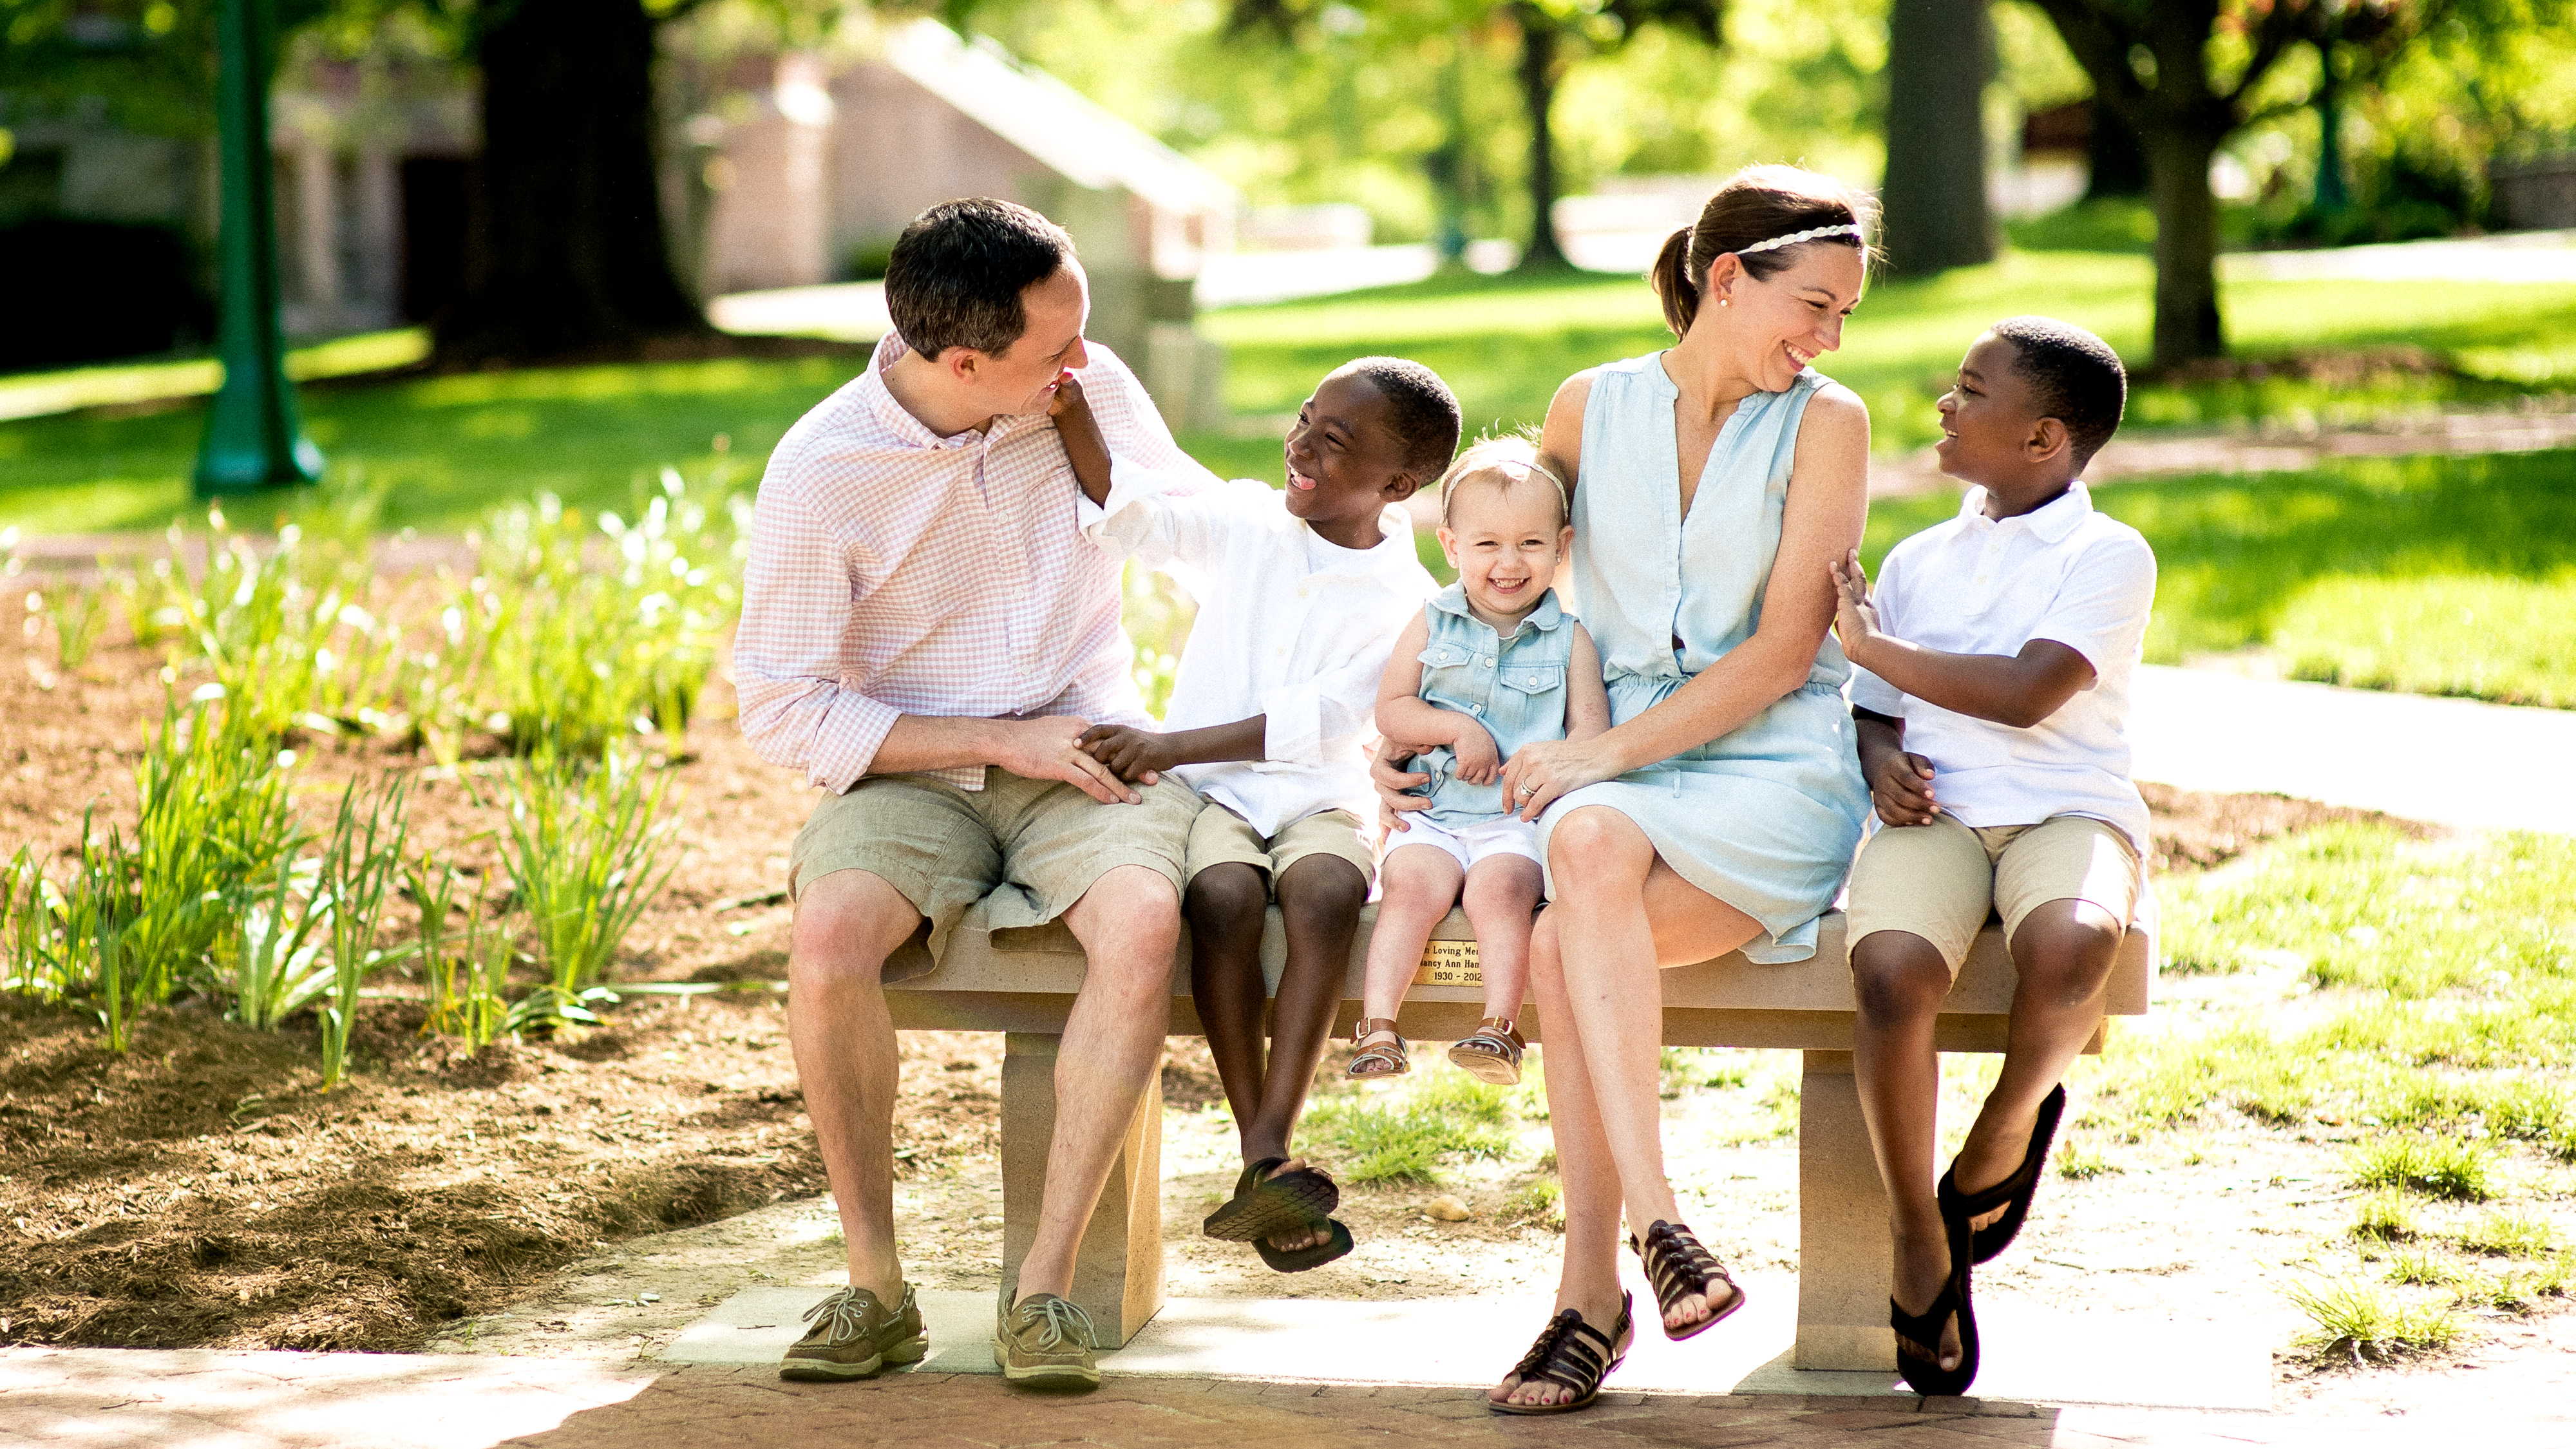 Relaxed, fun, and smiley family photos